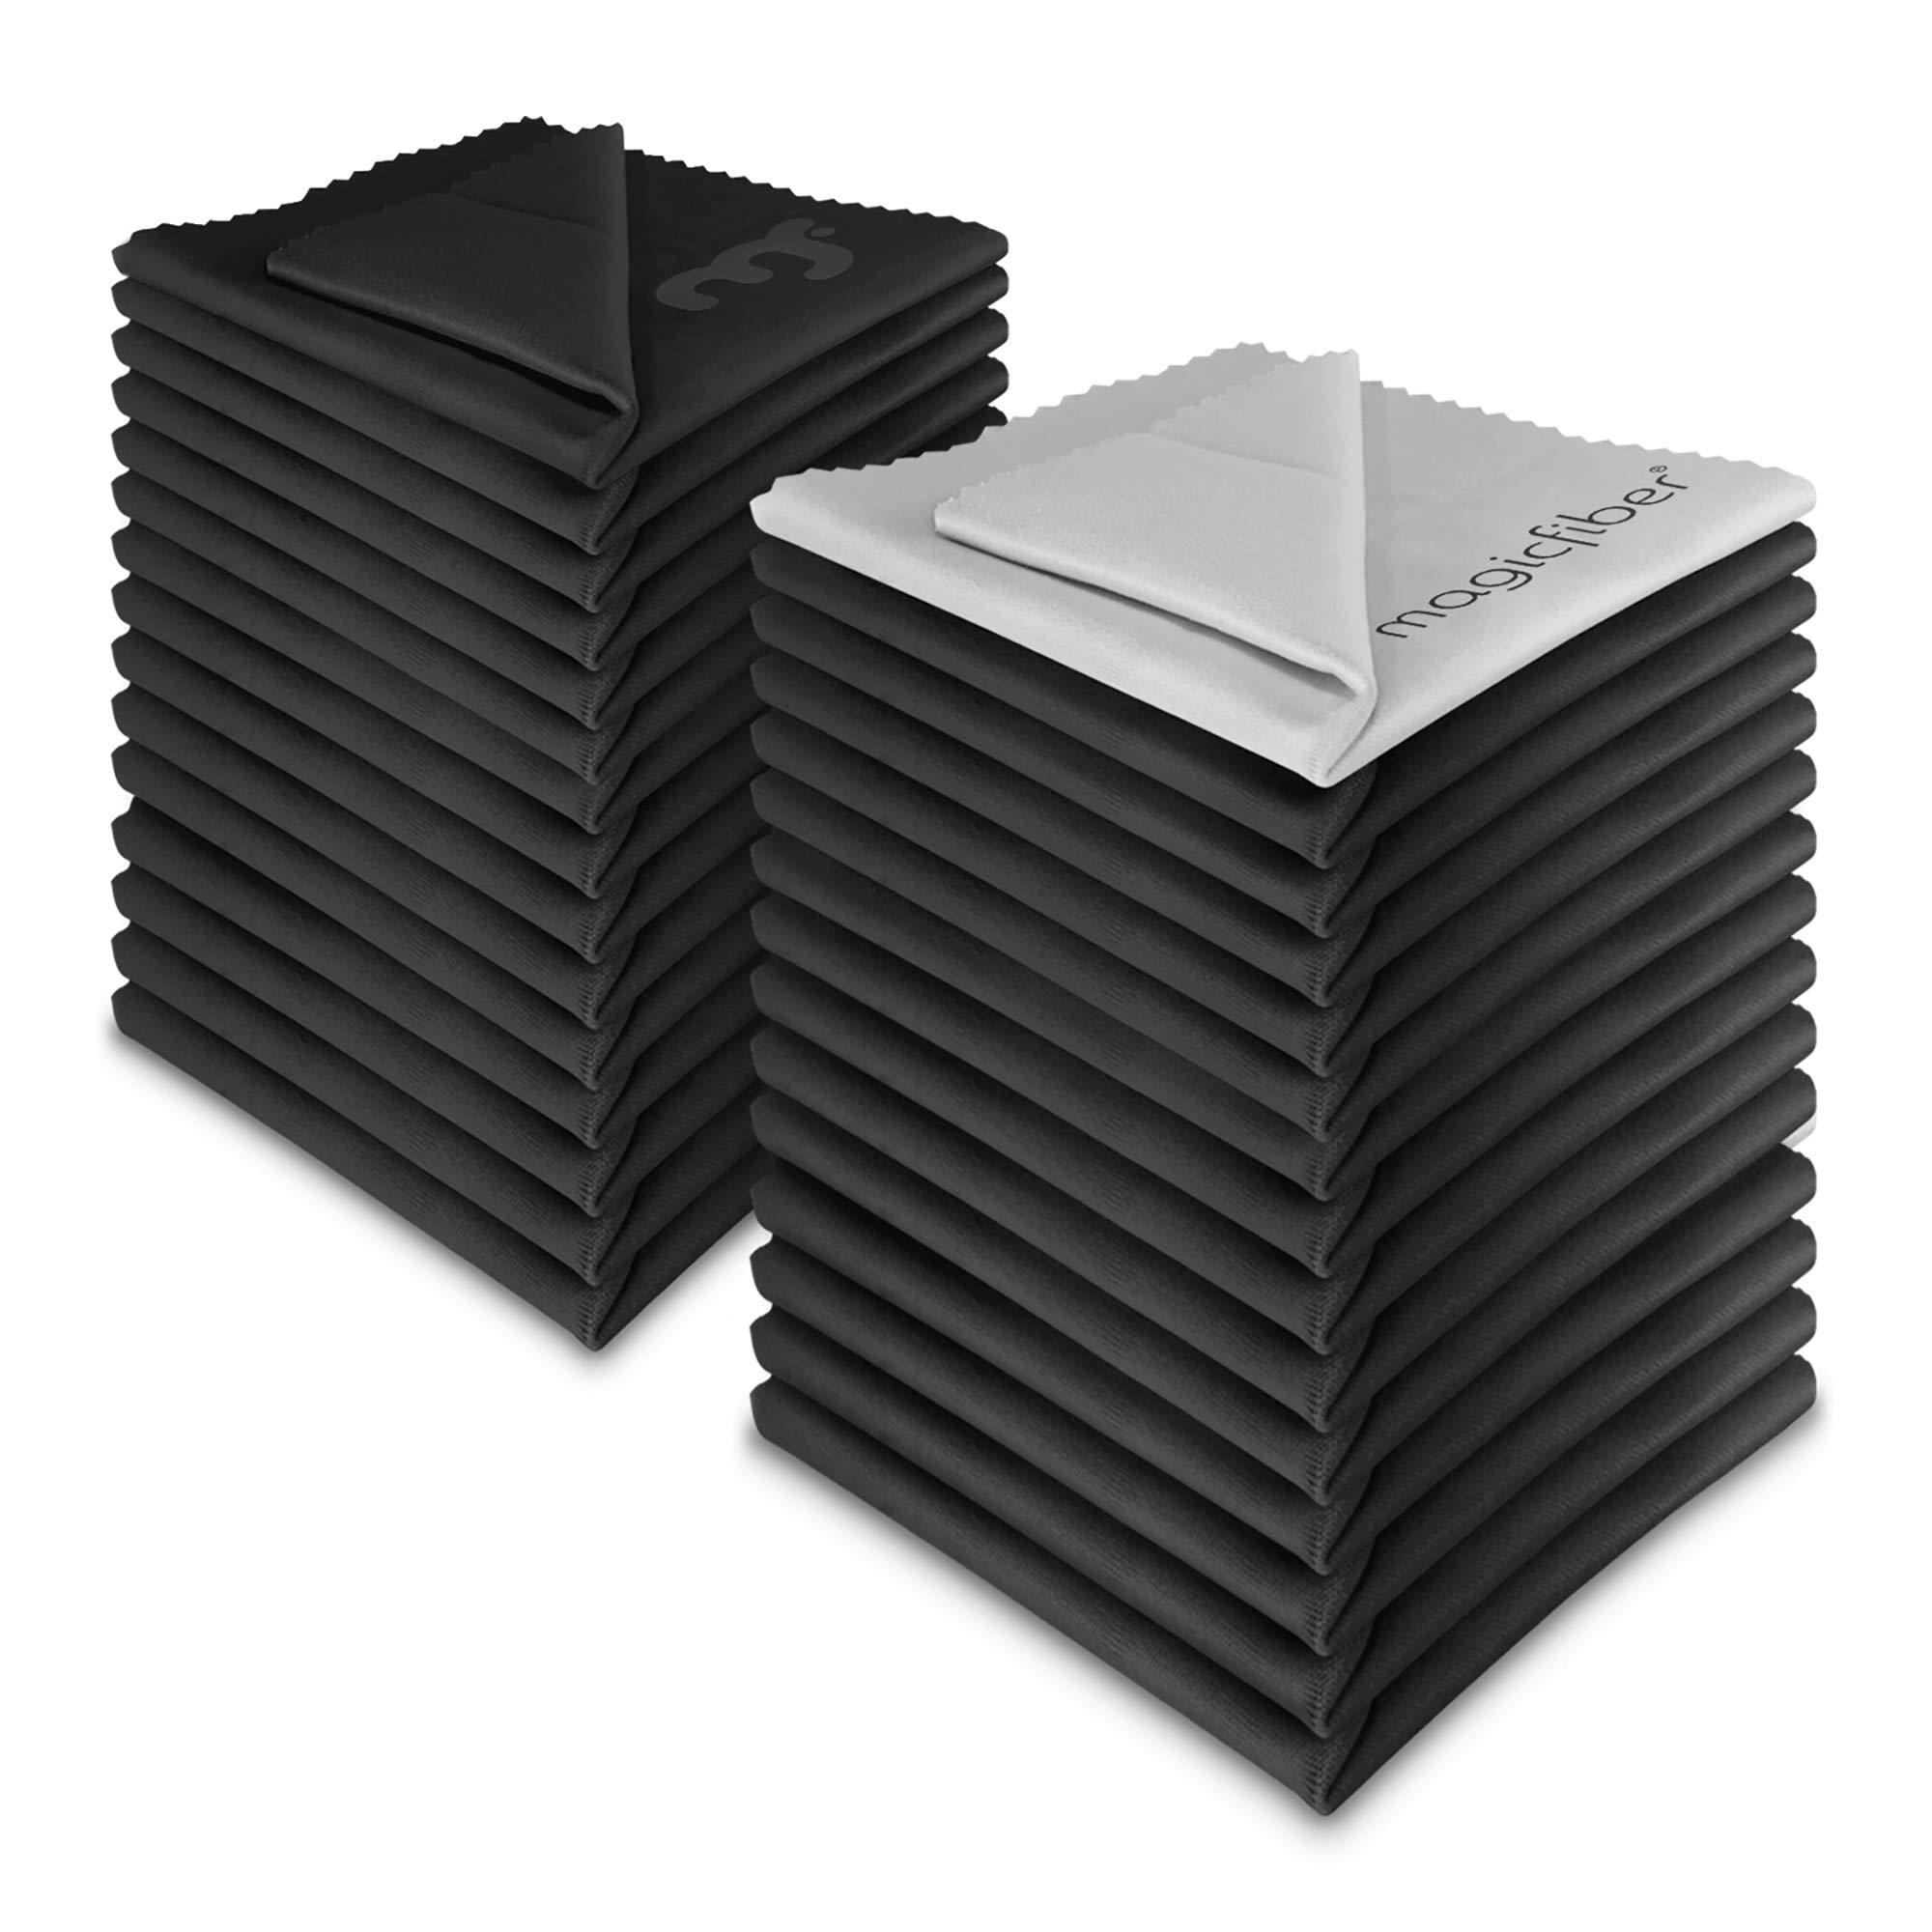 MagicFiber Microfiber Cleaning Cloths, 30 PACK by MagicFiber